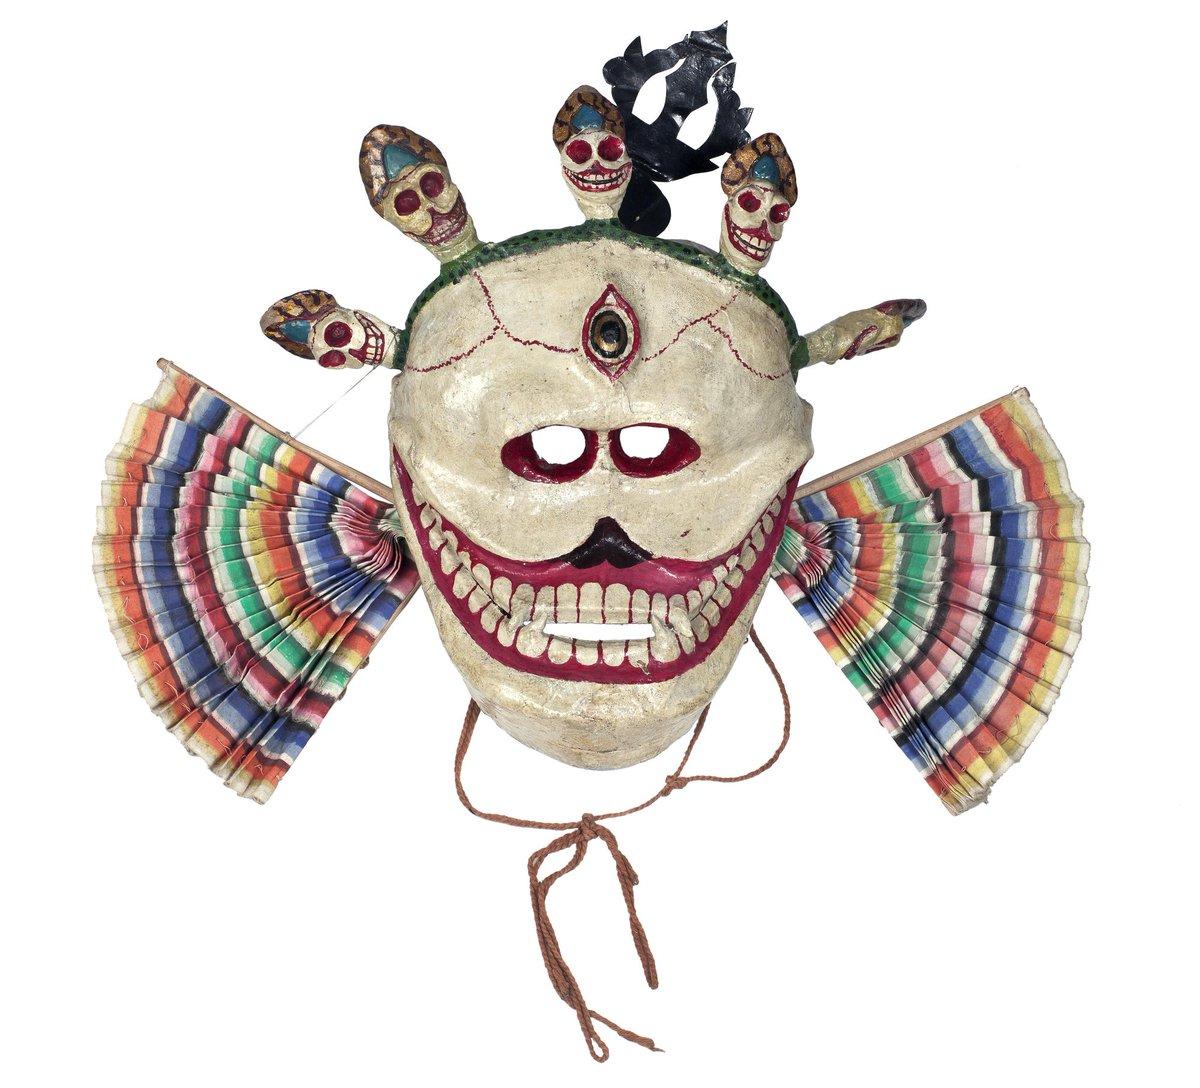 test Twitter Media - #InternationalDanceDay These items are parts of Cham Dance costumes worn by Tibetan Buddhist monks https://t.co/XNNpq8rs6S https://t.co/kwJf7Bd4CU